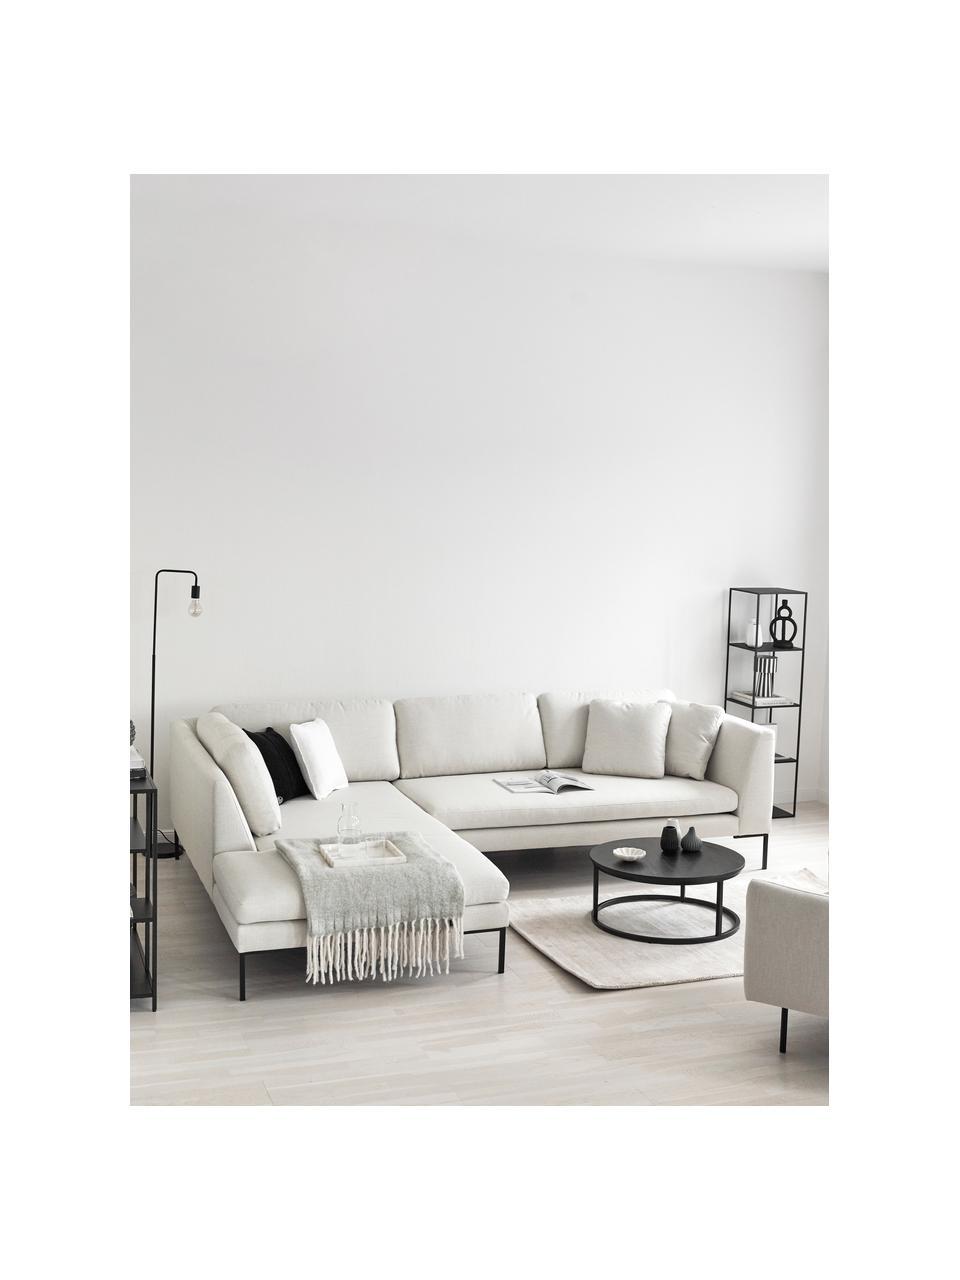 Canapé d'angle blanc crème Emma, Tissu blanc crème, pieds noirs